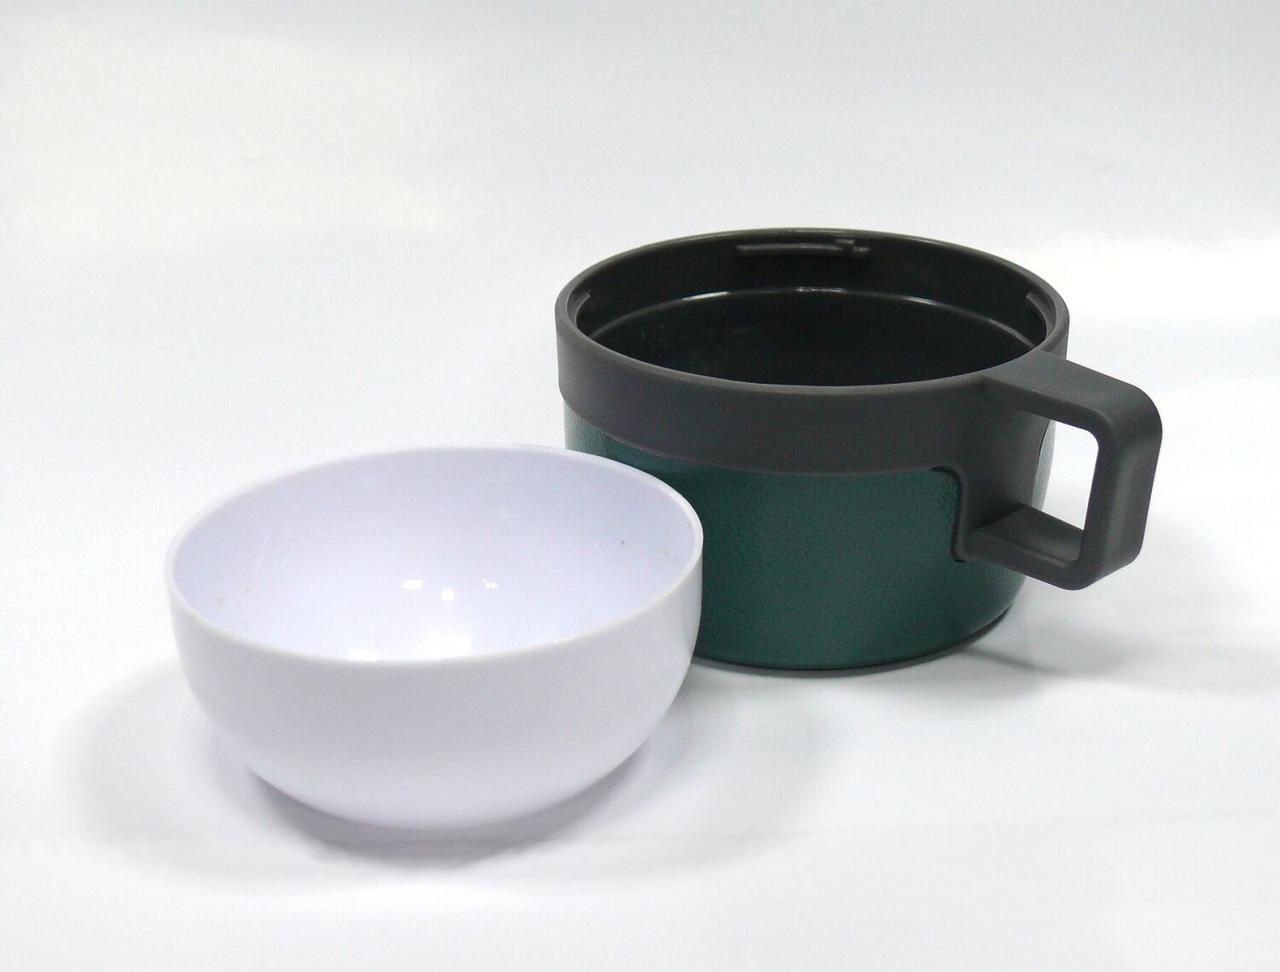 Крышка для термоса Tramp Greenline 1.2 - 1.5 л